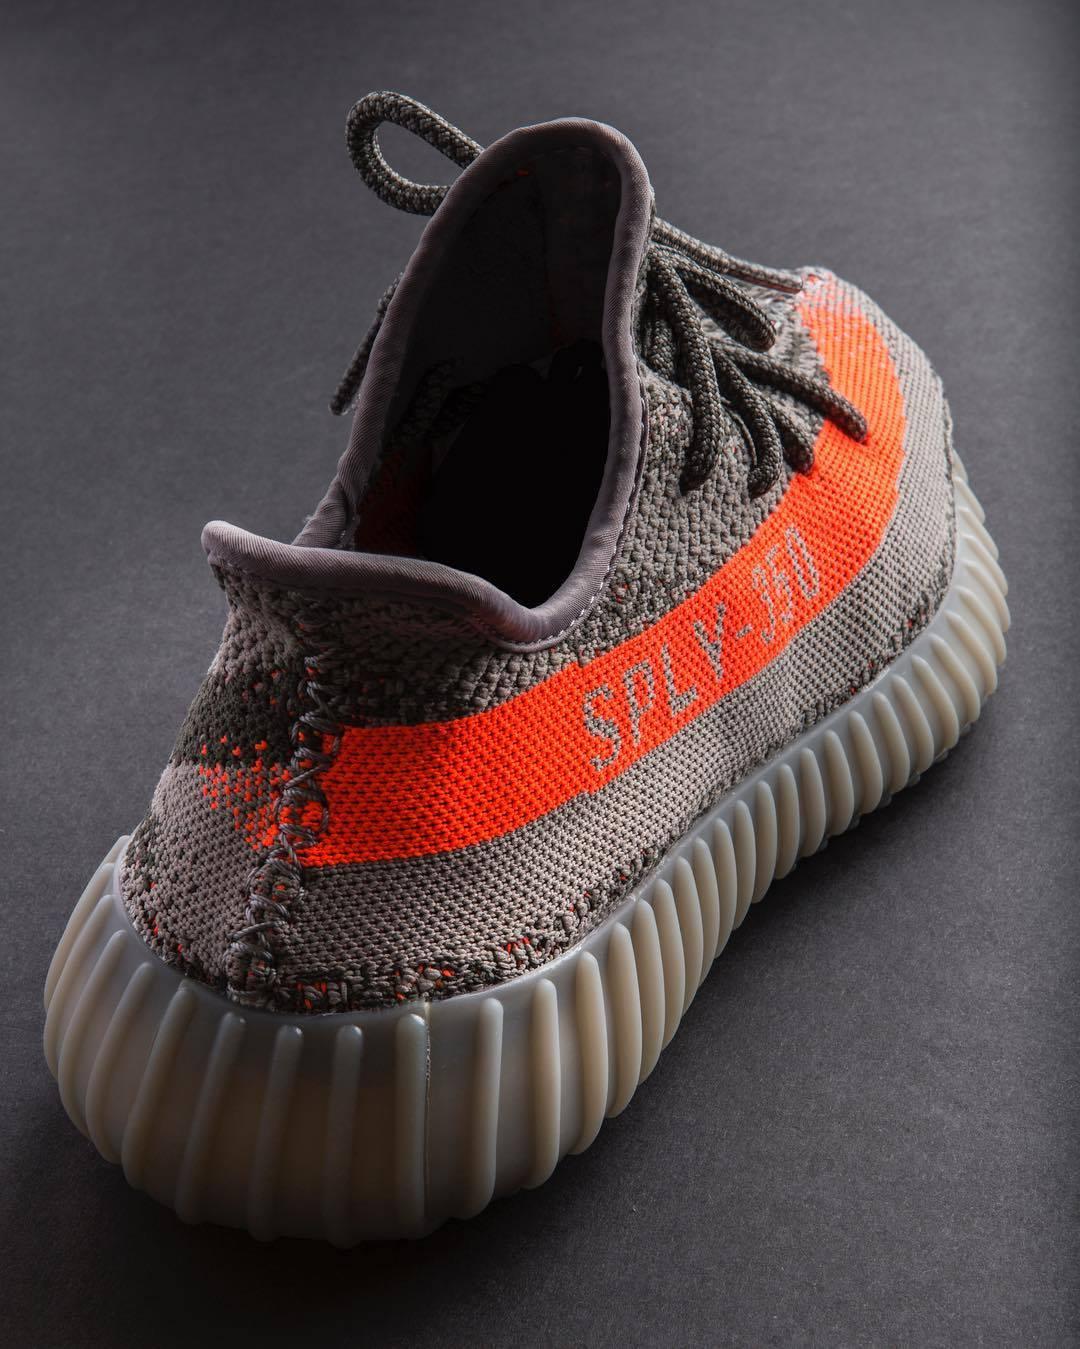 adidas-yeezy-boost-350-v2-beluga-04